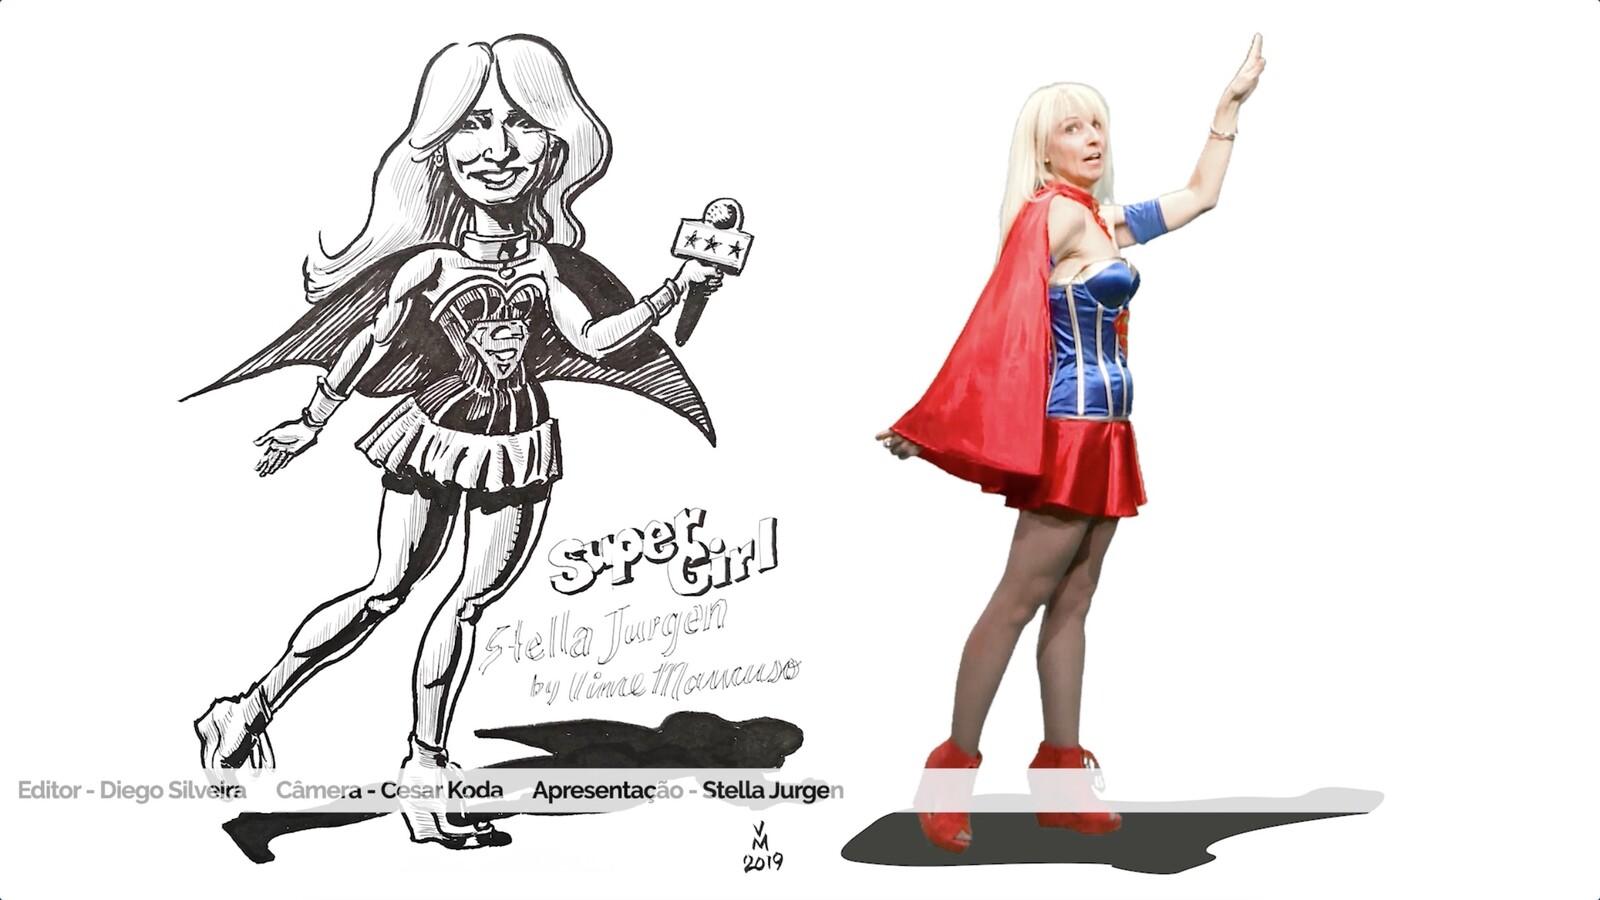 Caricature of TV hostess Stella Jurgen